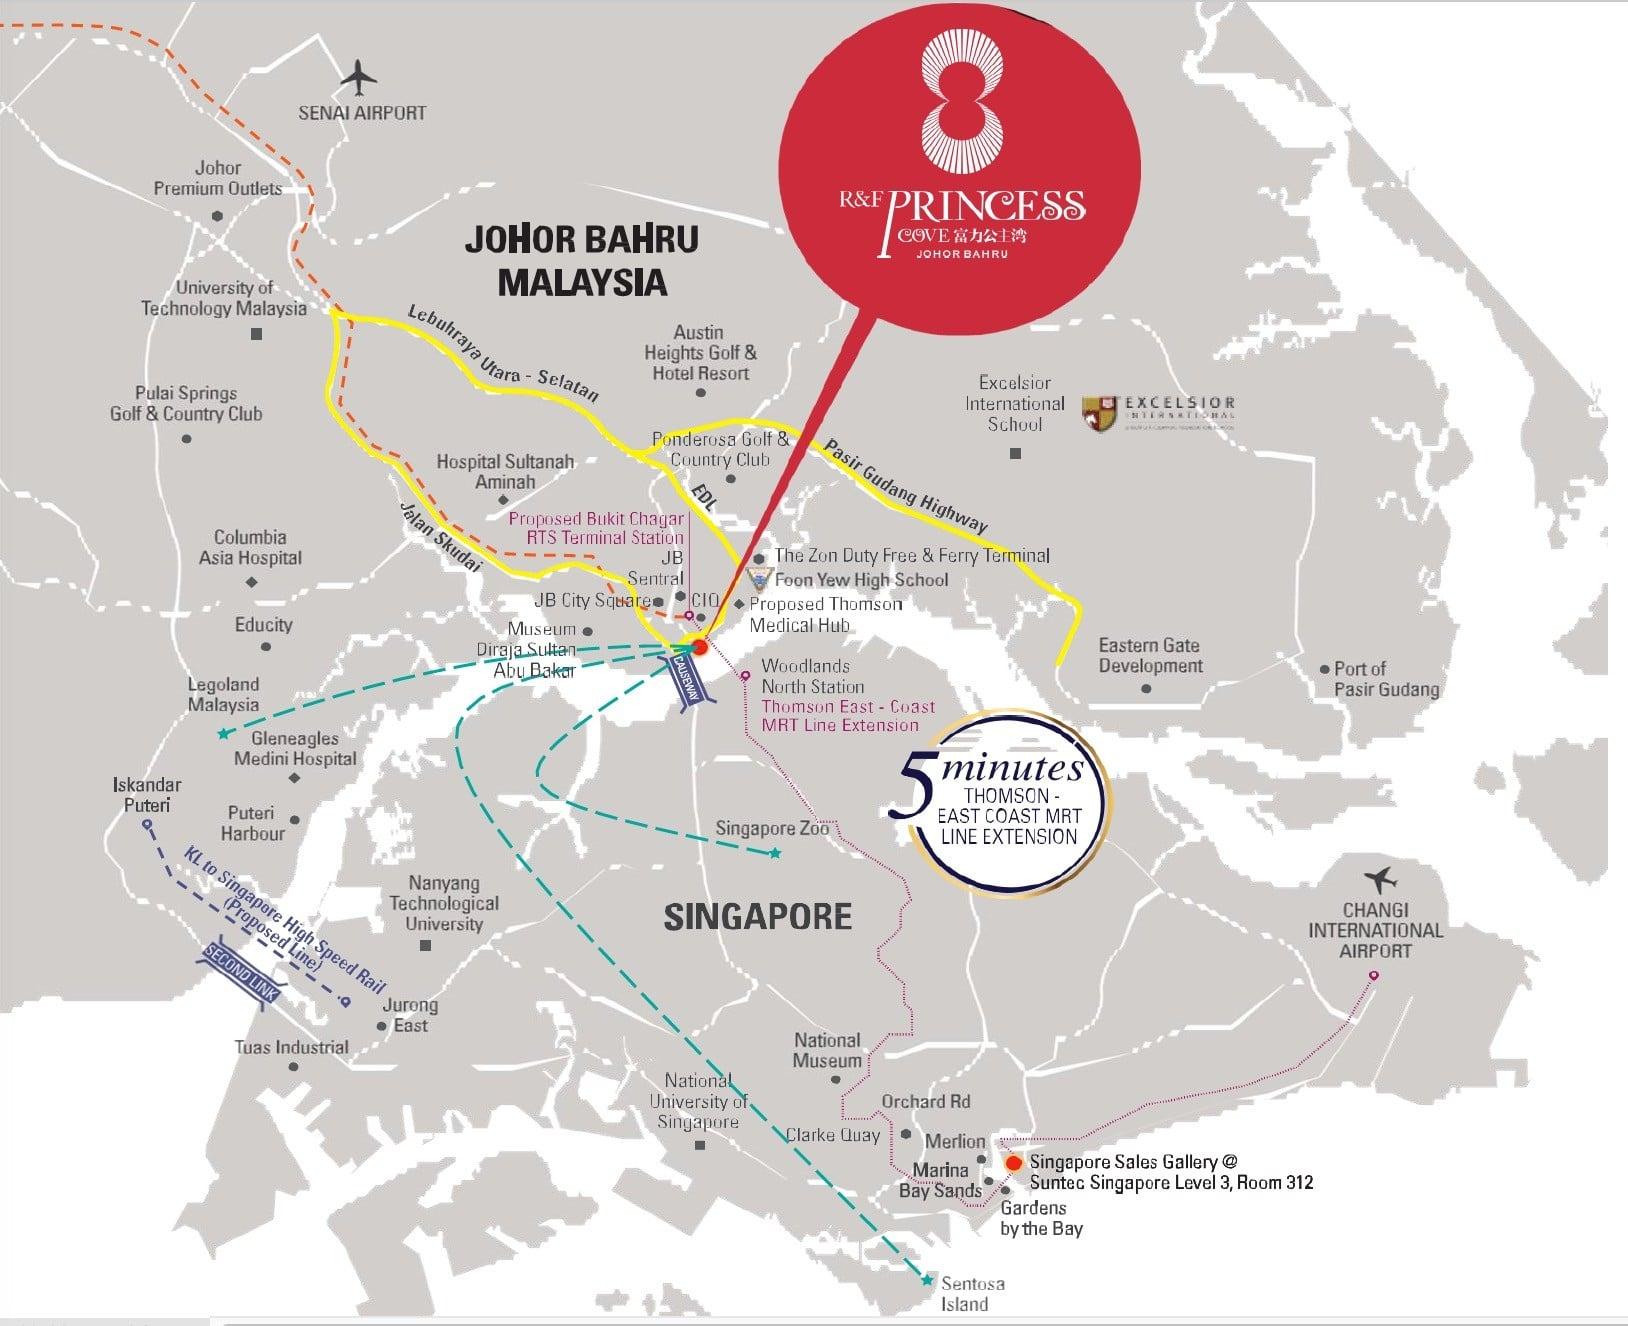 RF Princess Cove JB location map